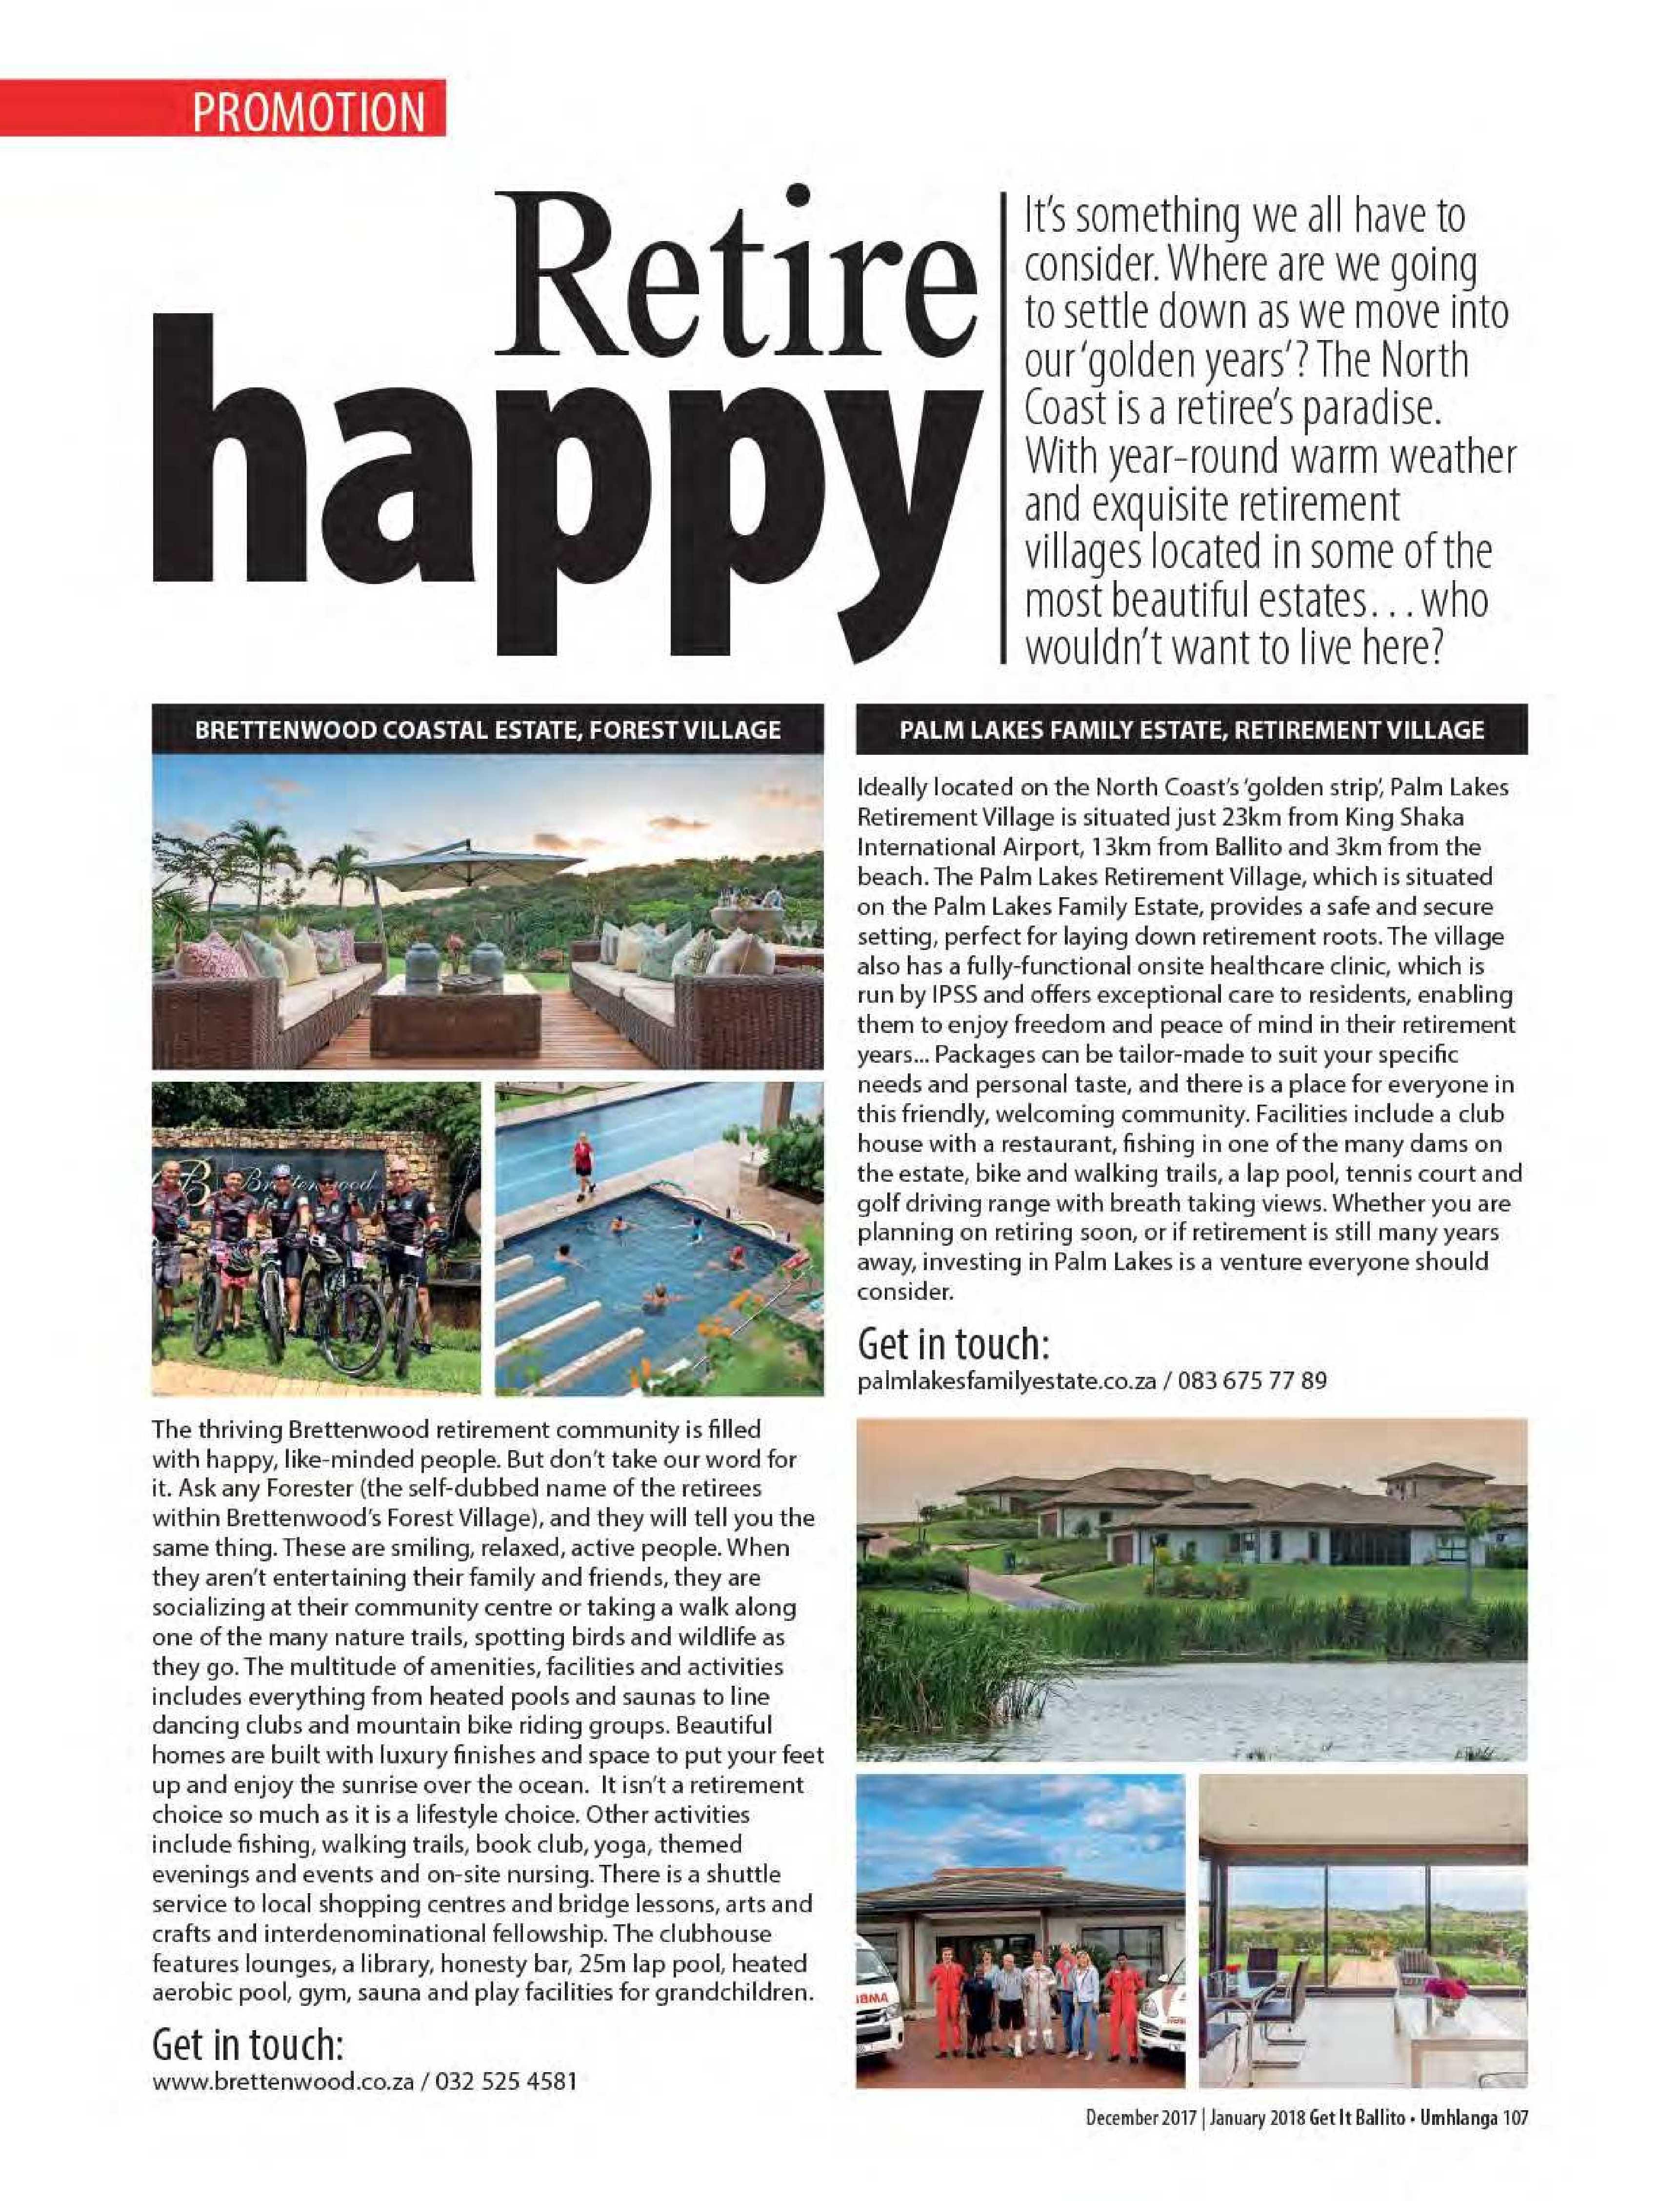 get-magazine-ballitoumhlanga-december-2017-january-2018-2-epapers-page-109